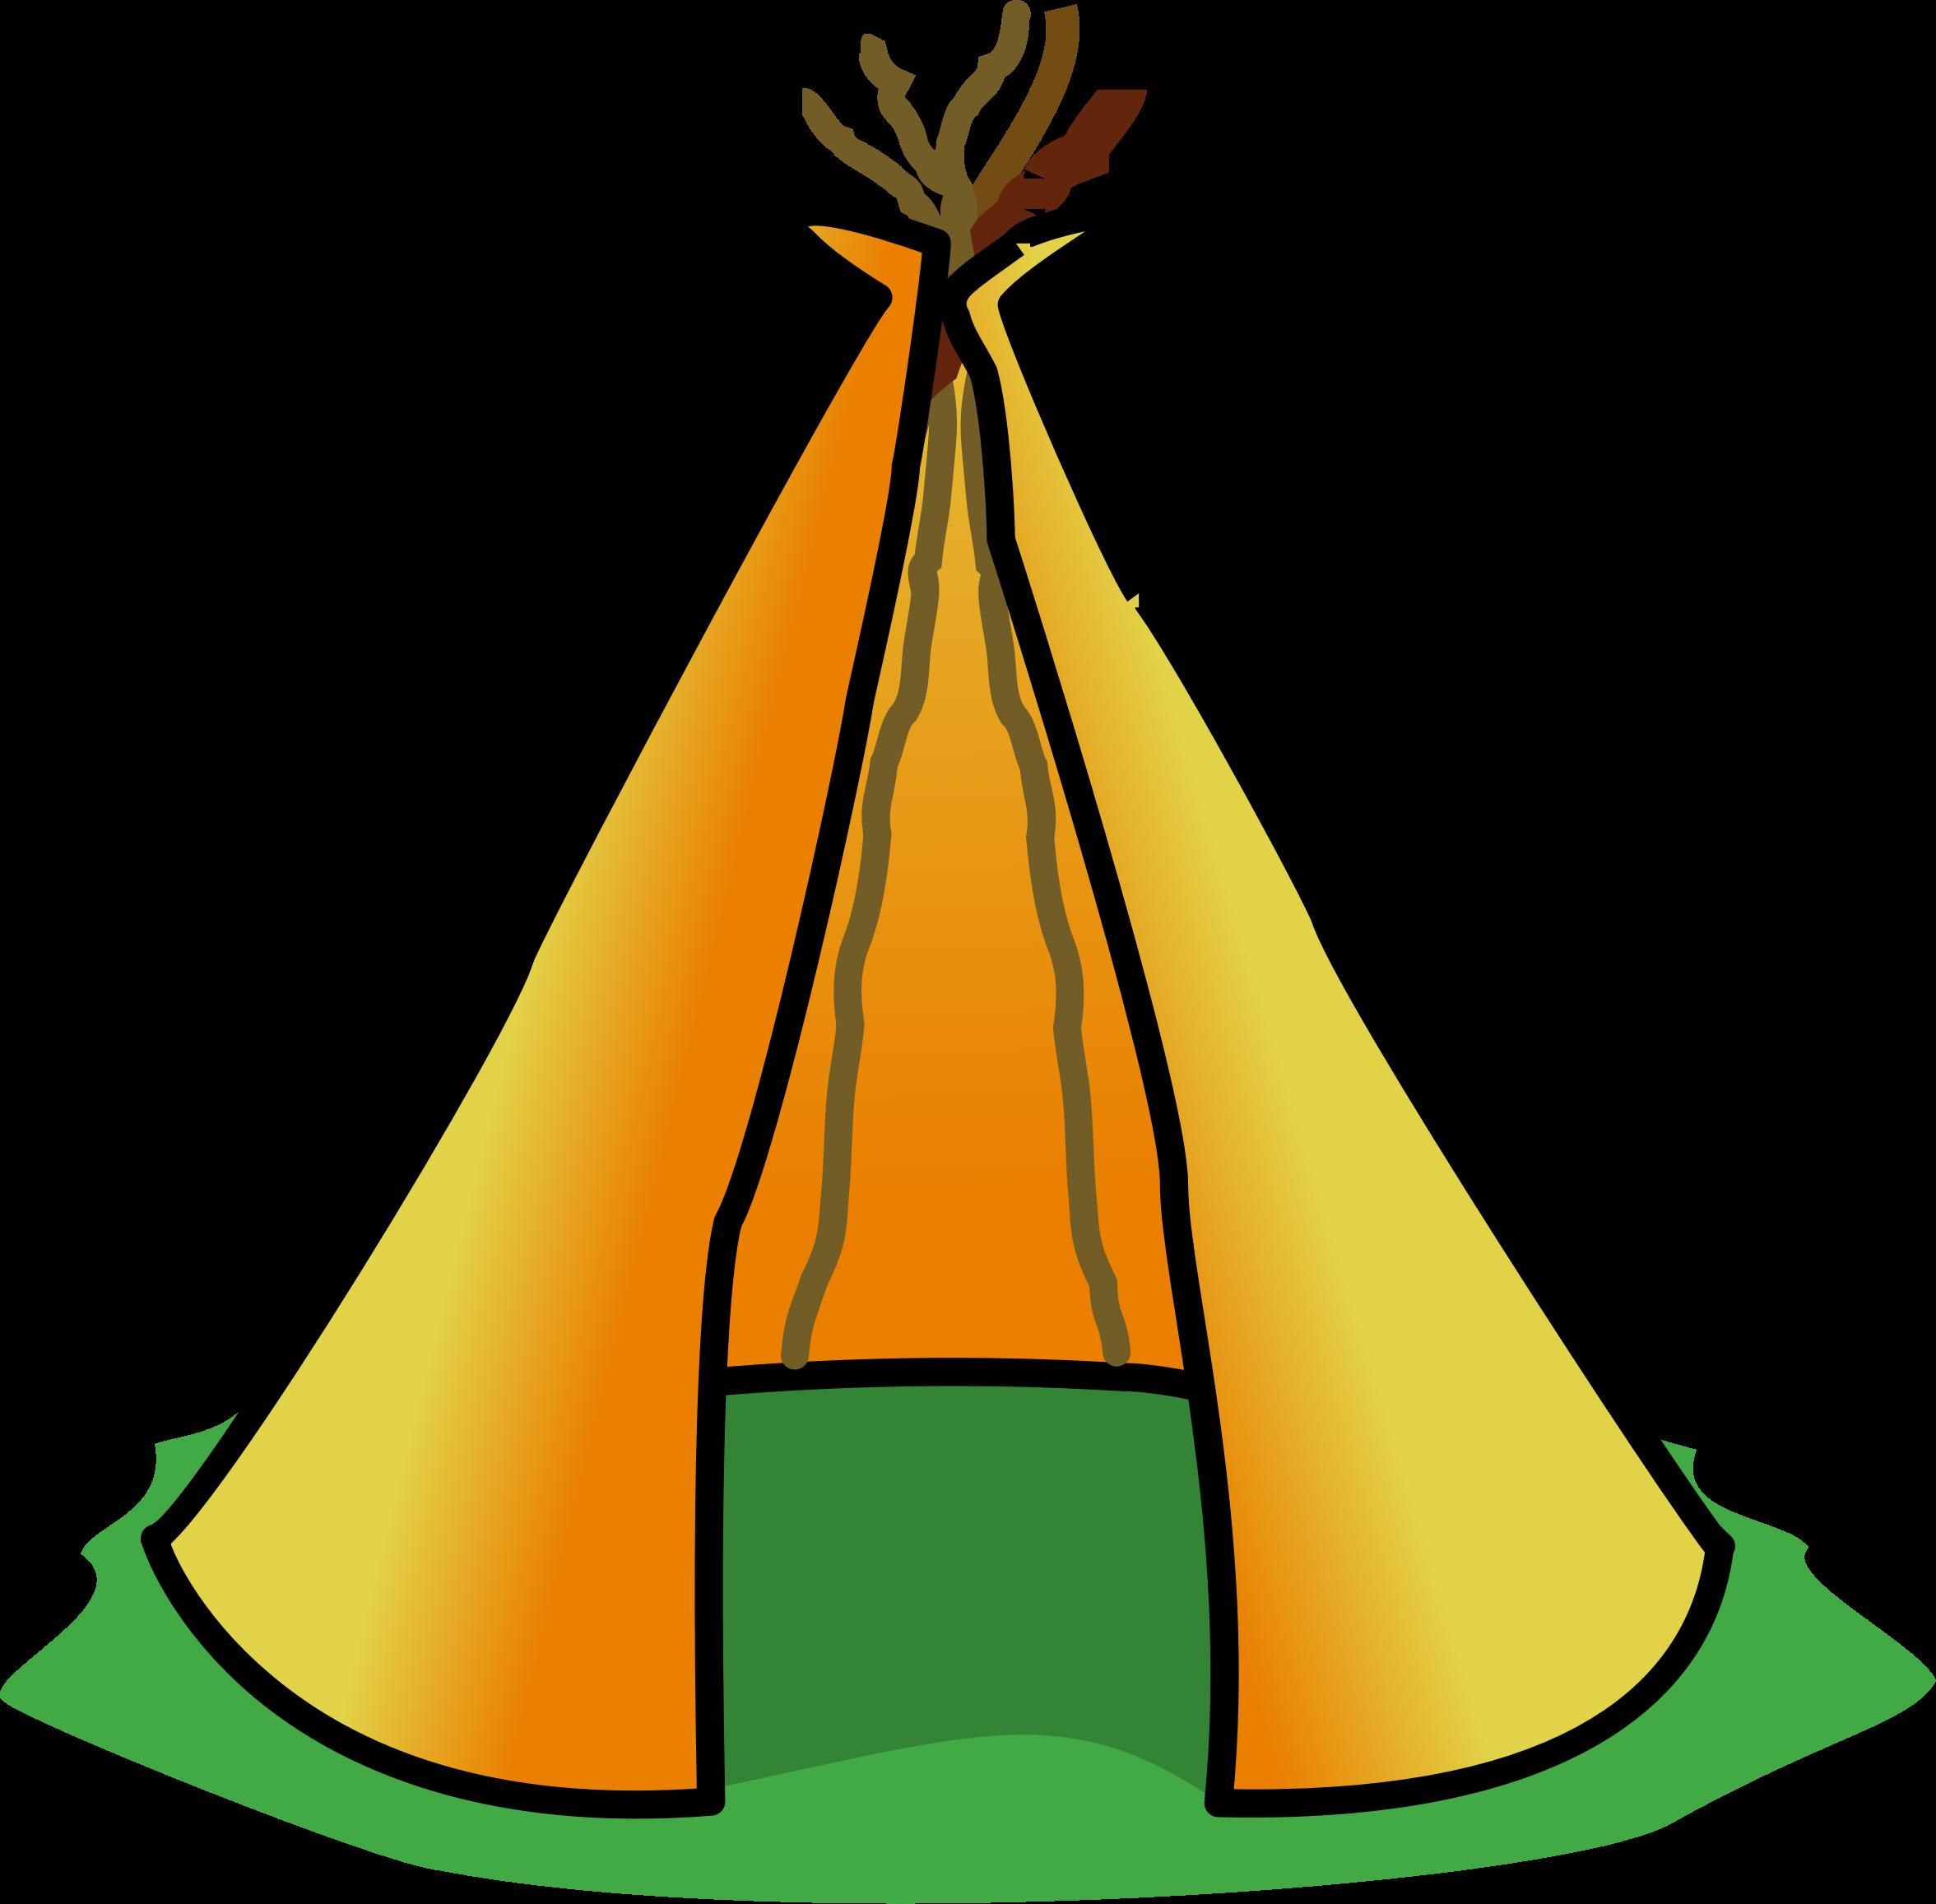 Native American clipart teepee tent Teepee teepee Clipart